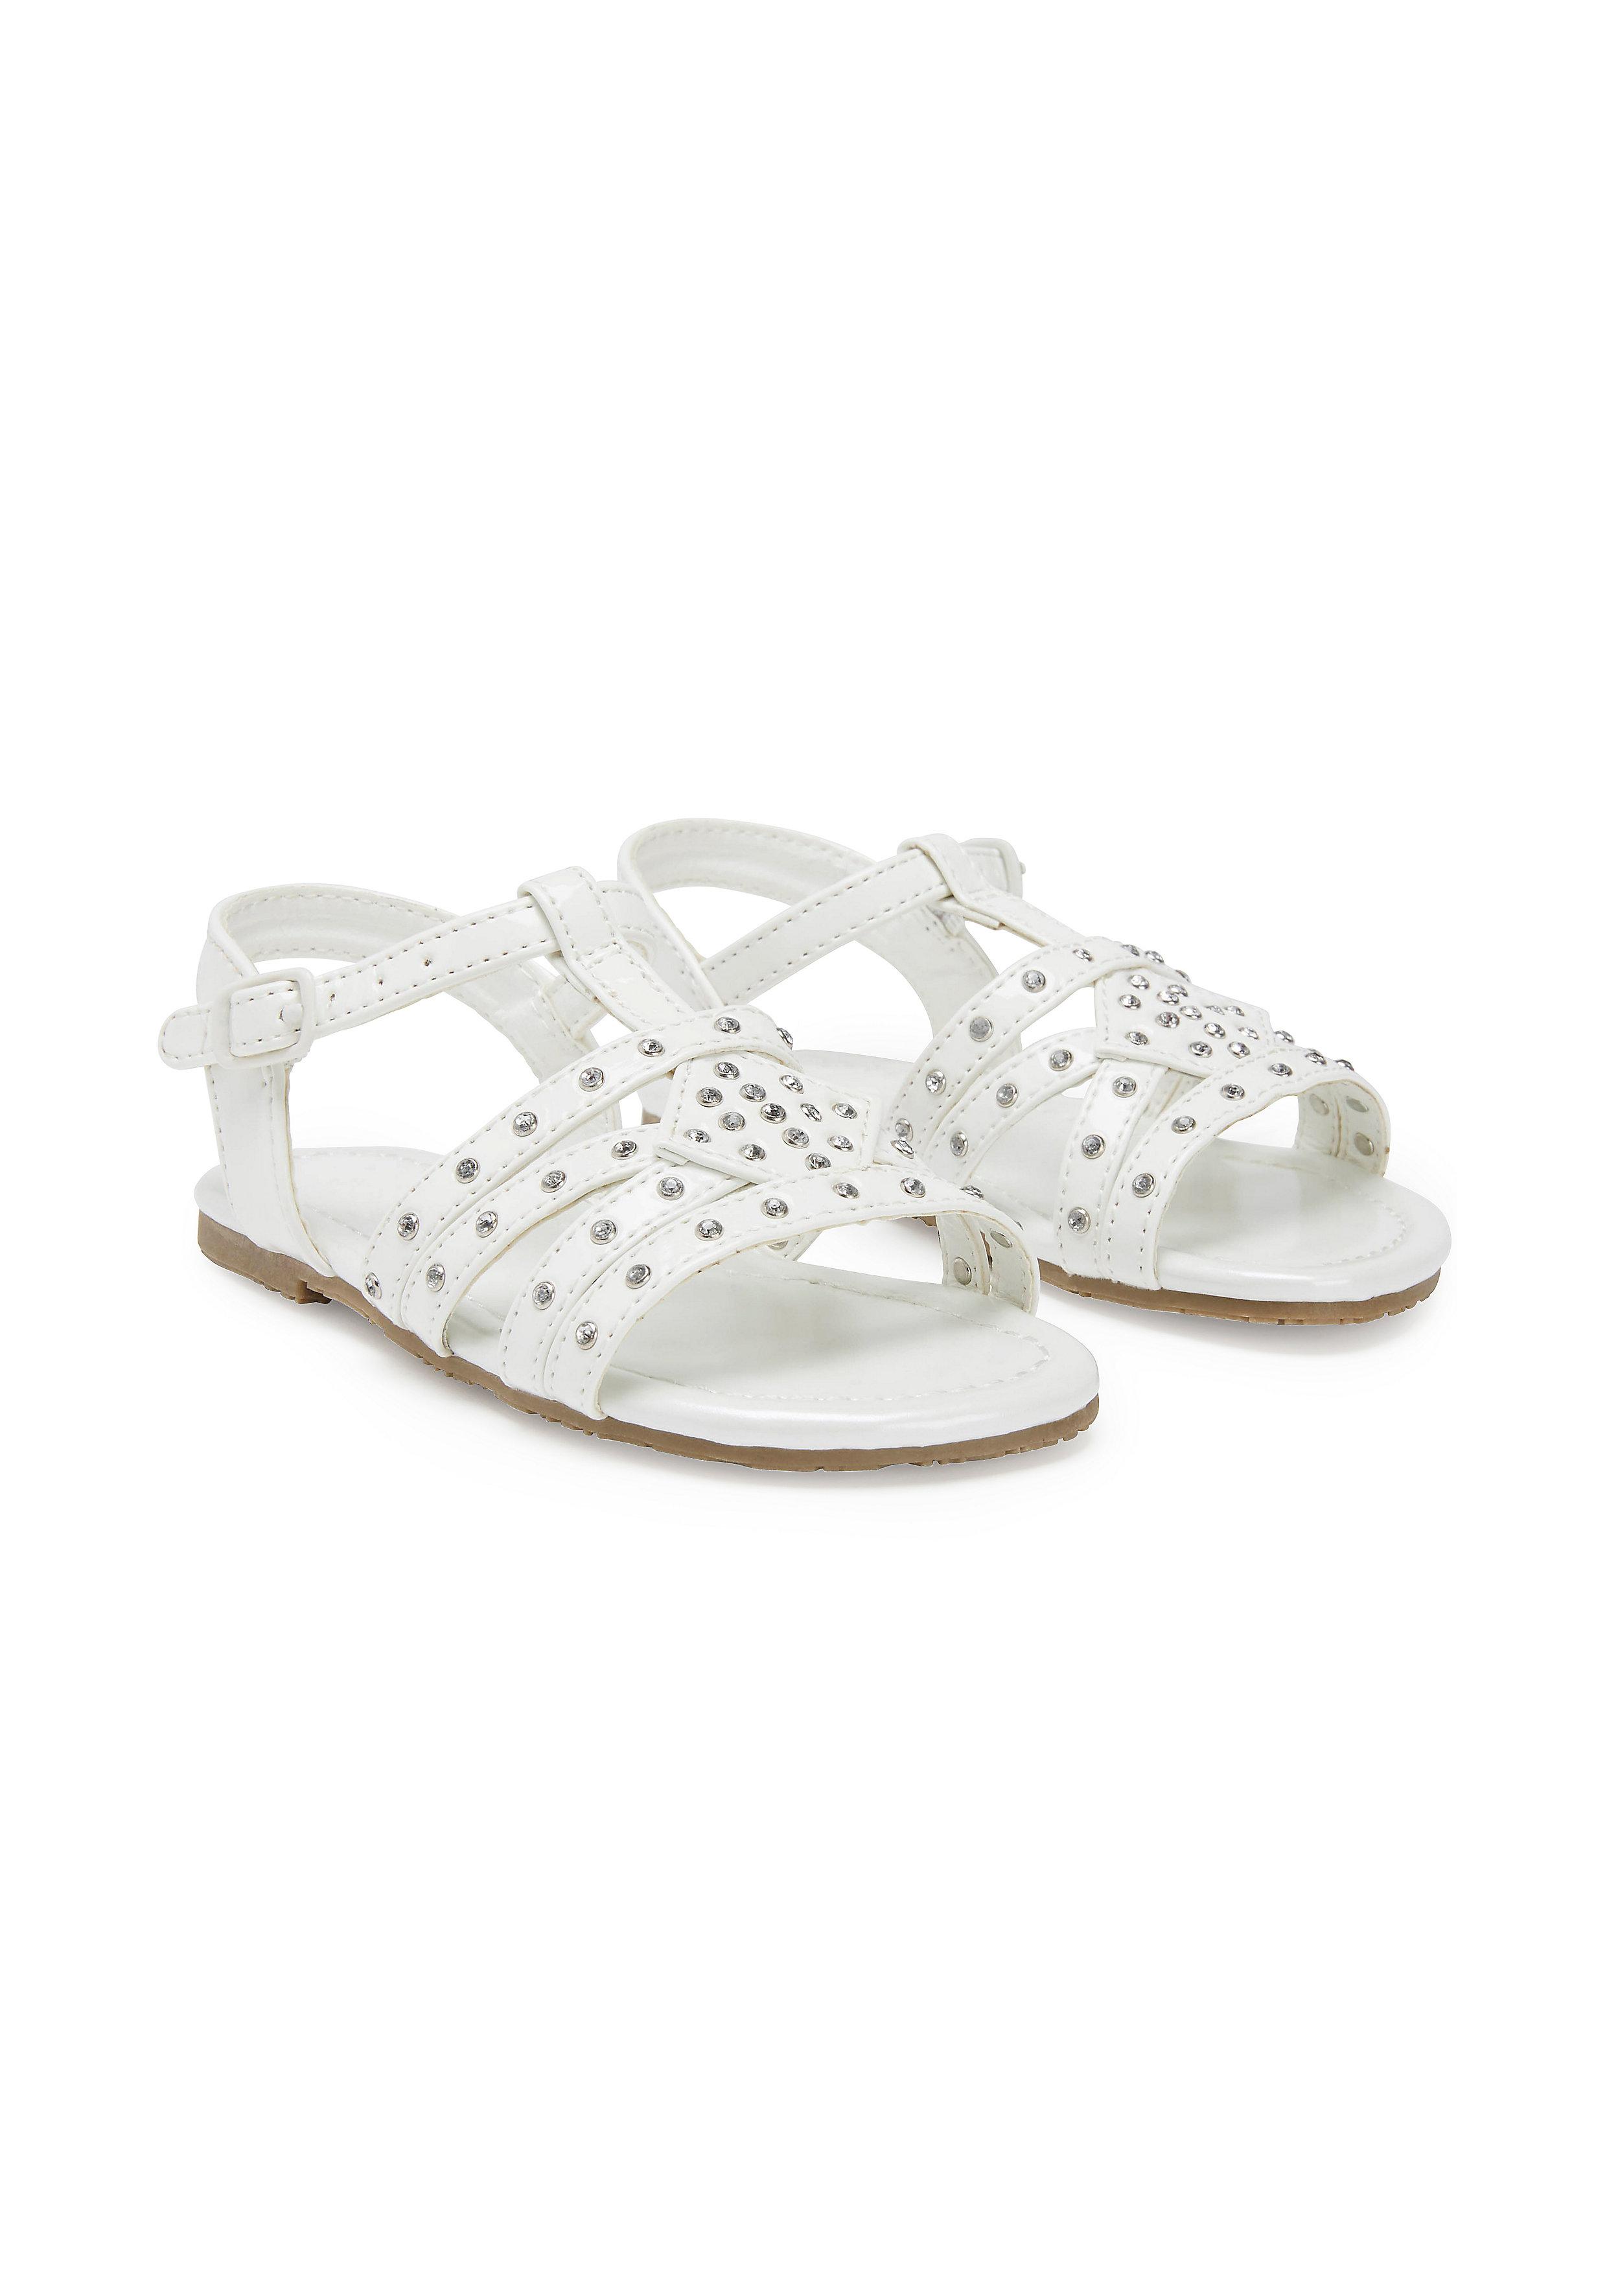 Mothercare   Girls T-Bar Sandals - White